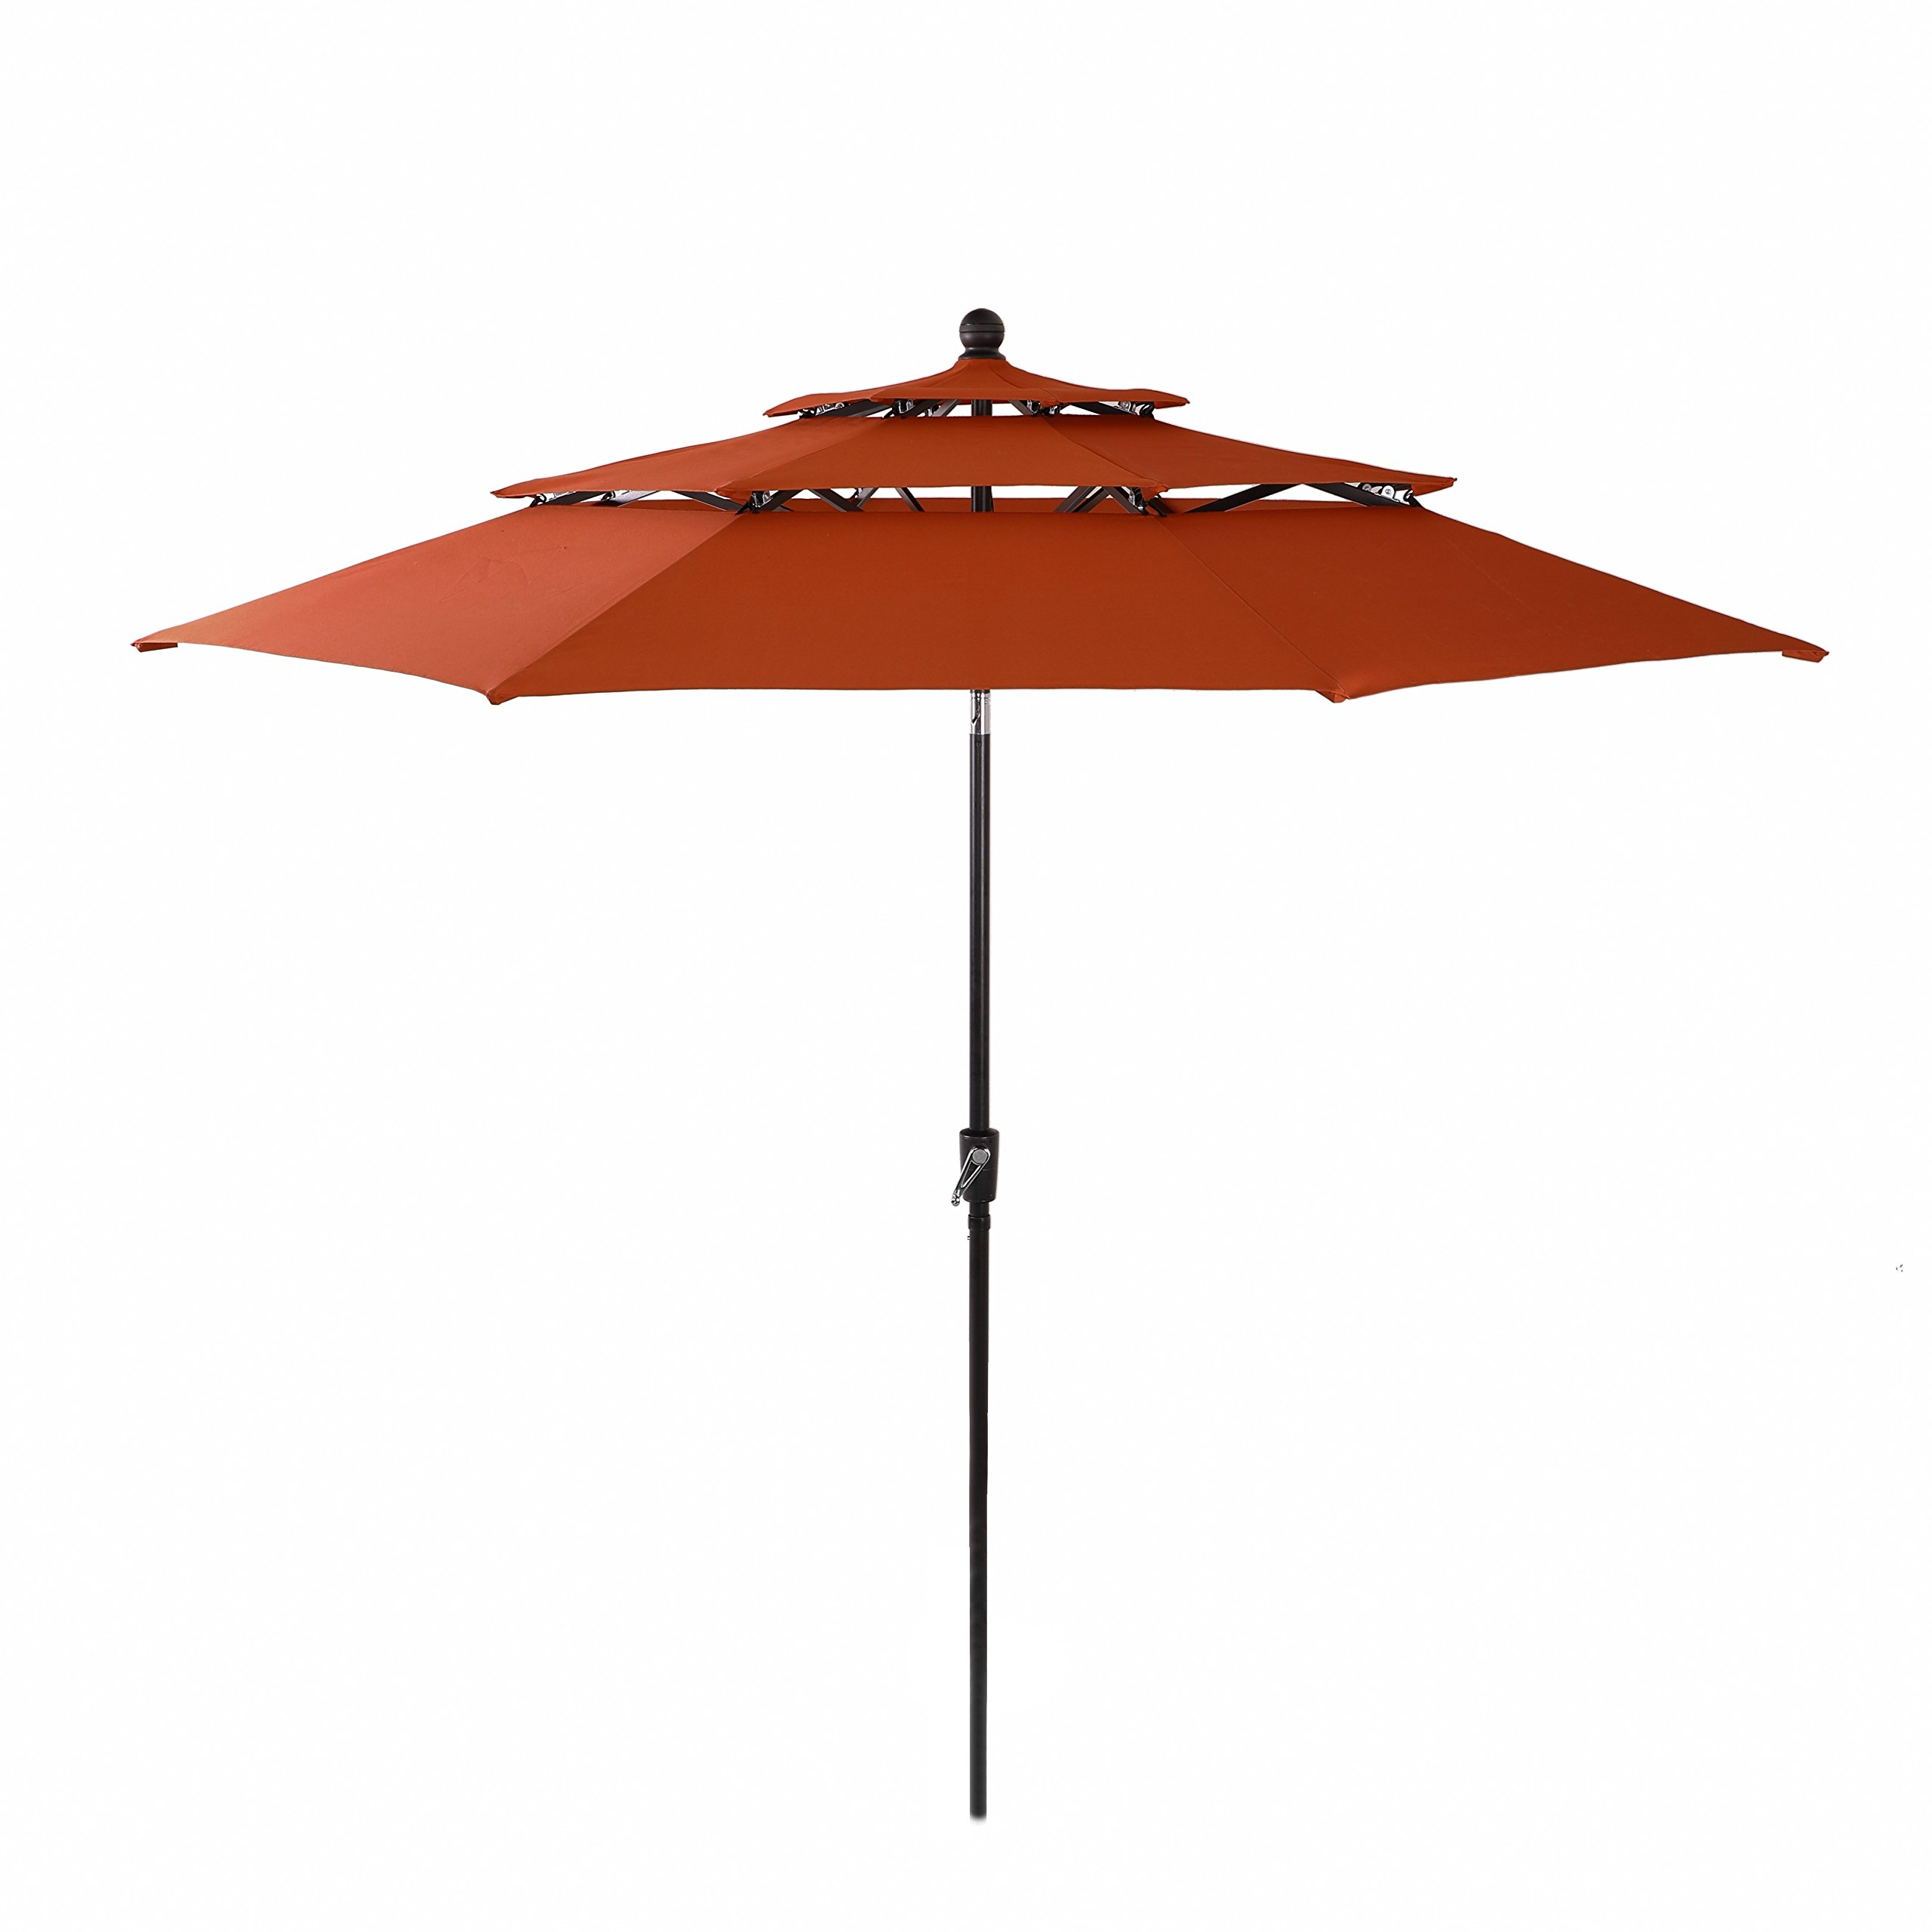 PHI VILLA 10ft 3 Tier Auto-tilt Patio Umbrella Outdoor Double Vented Umbrella, Orange Red